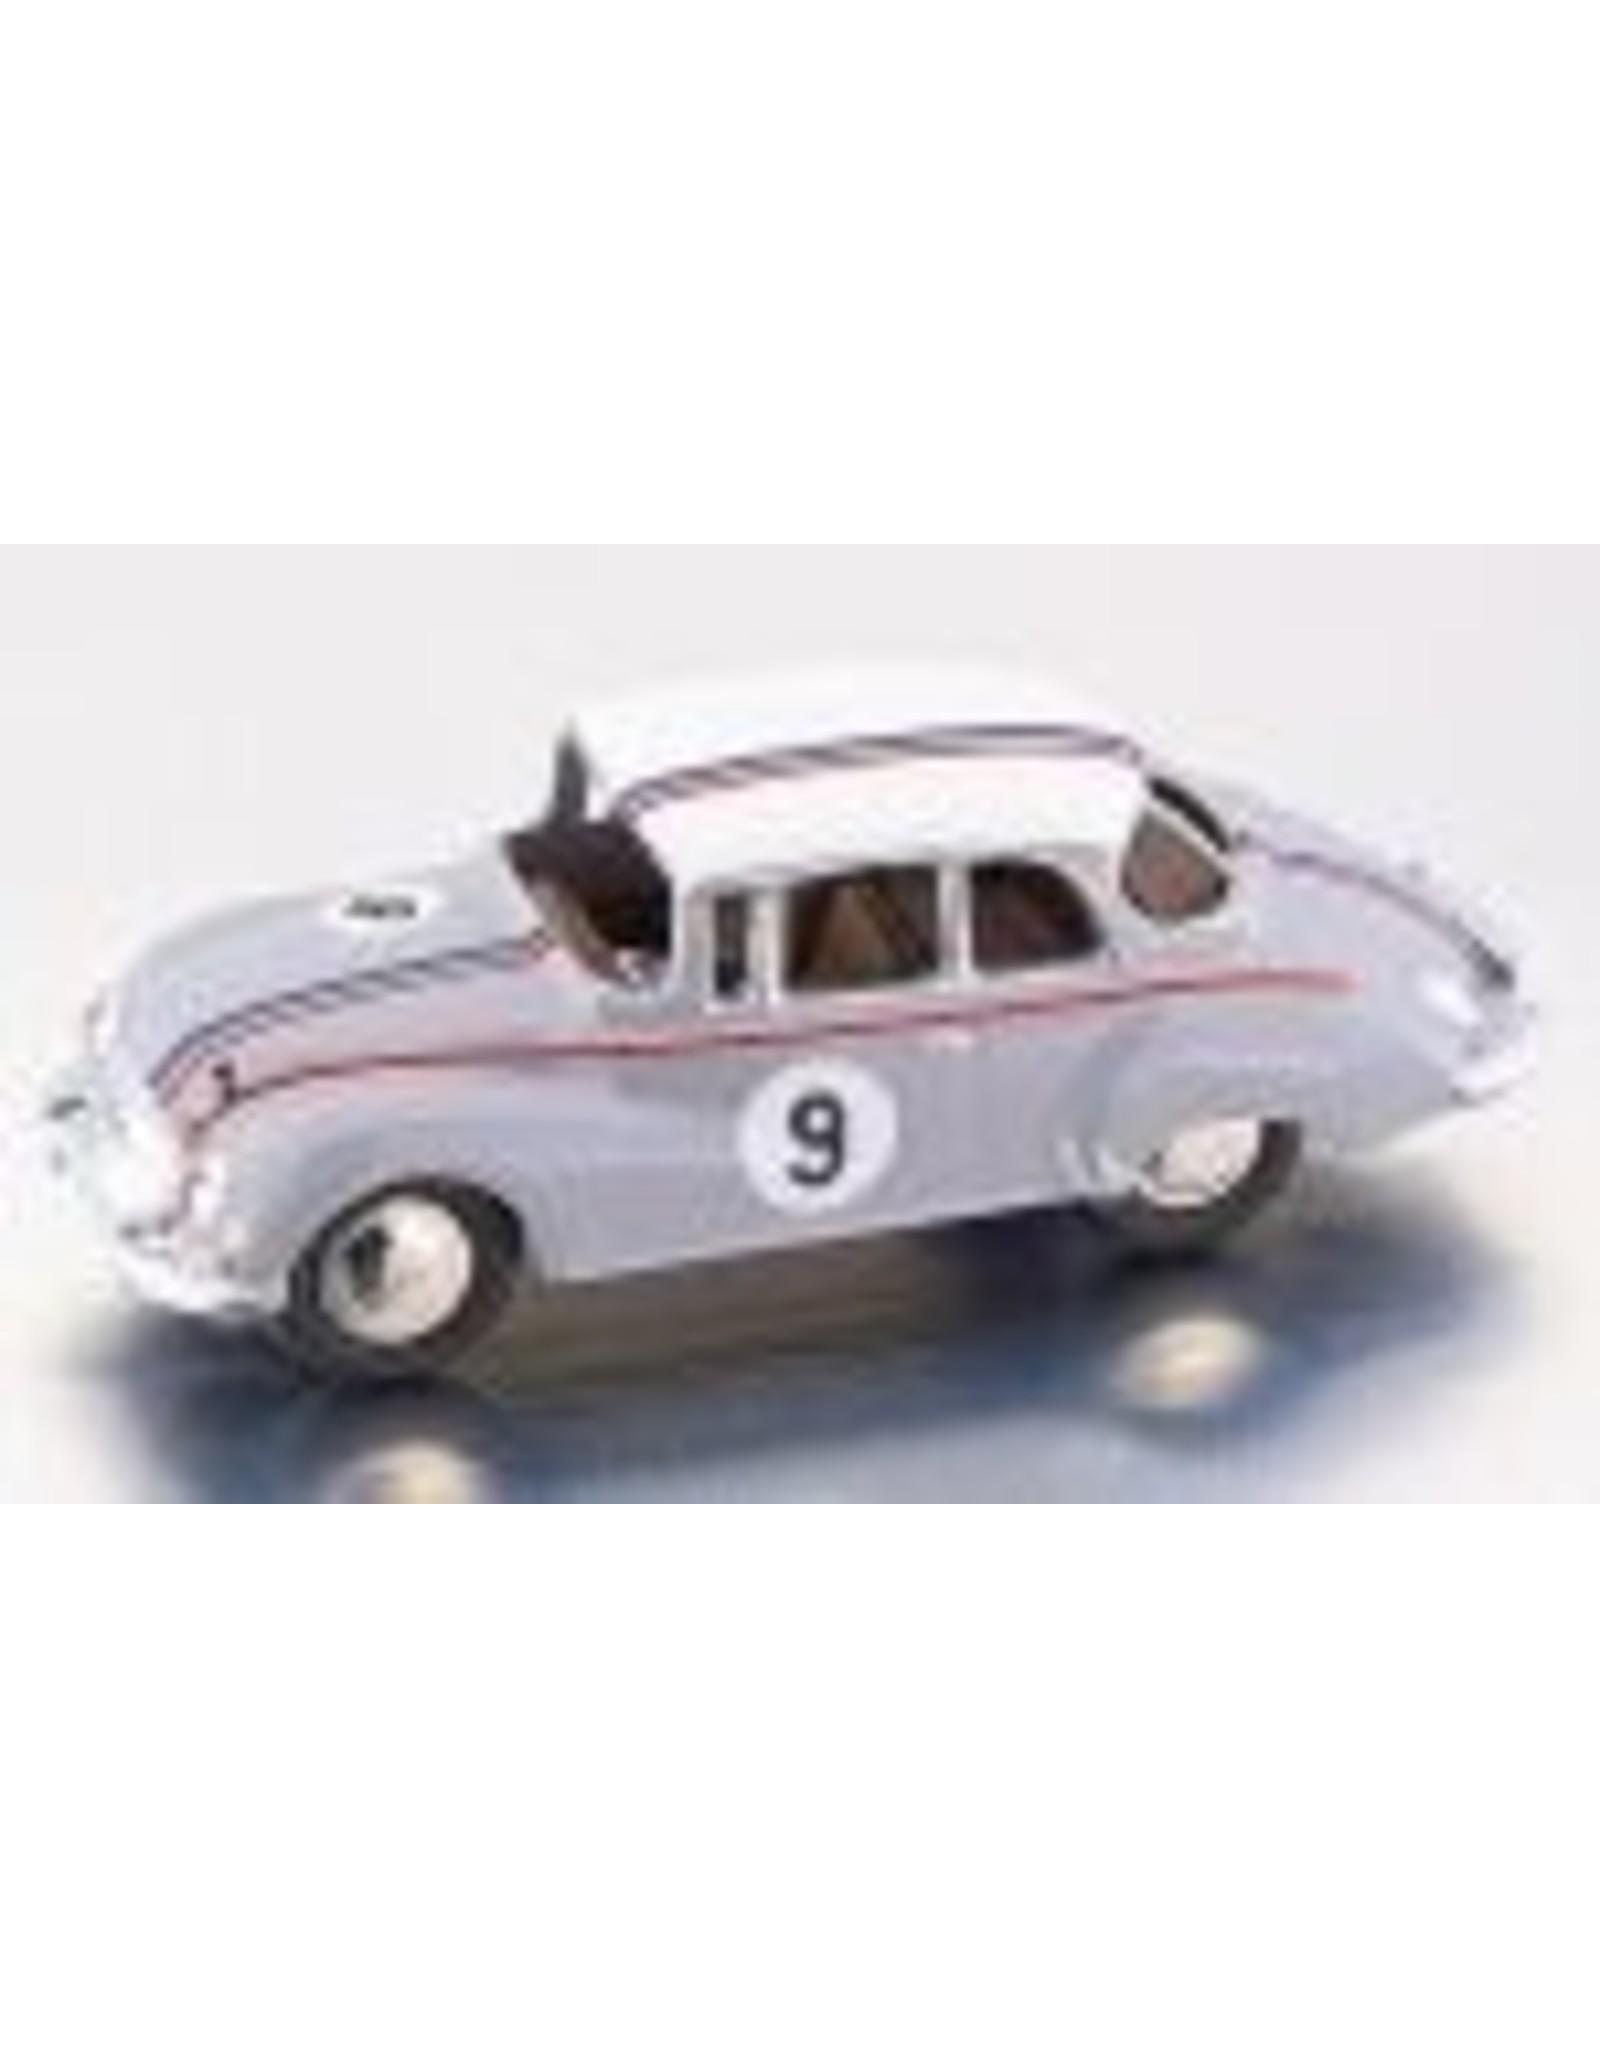 Auto Union AUTO UNION 1000S RACE VERSION #9(gray)